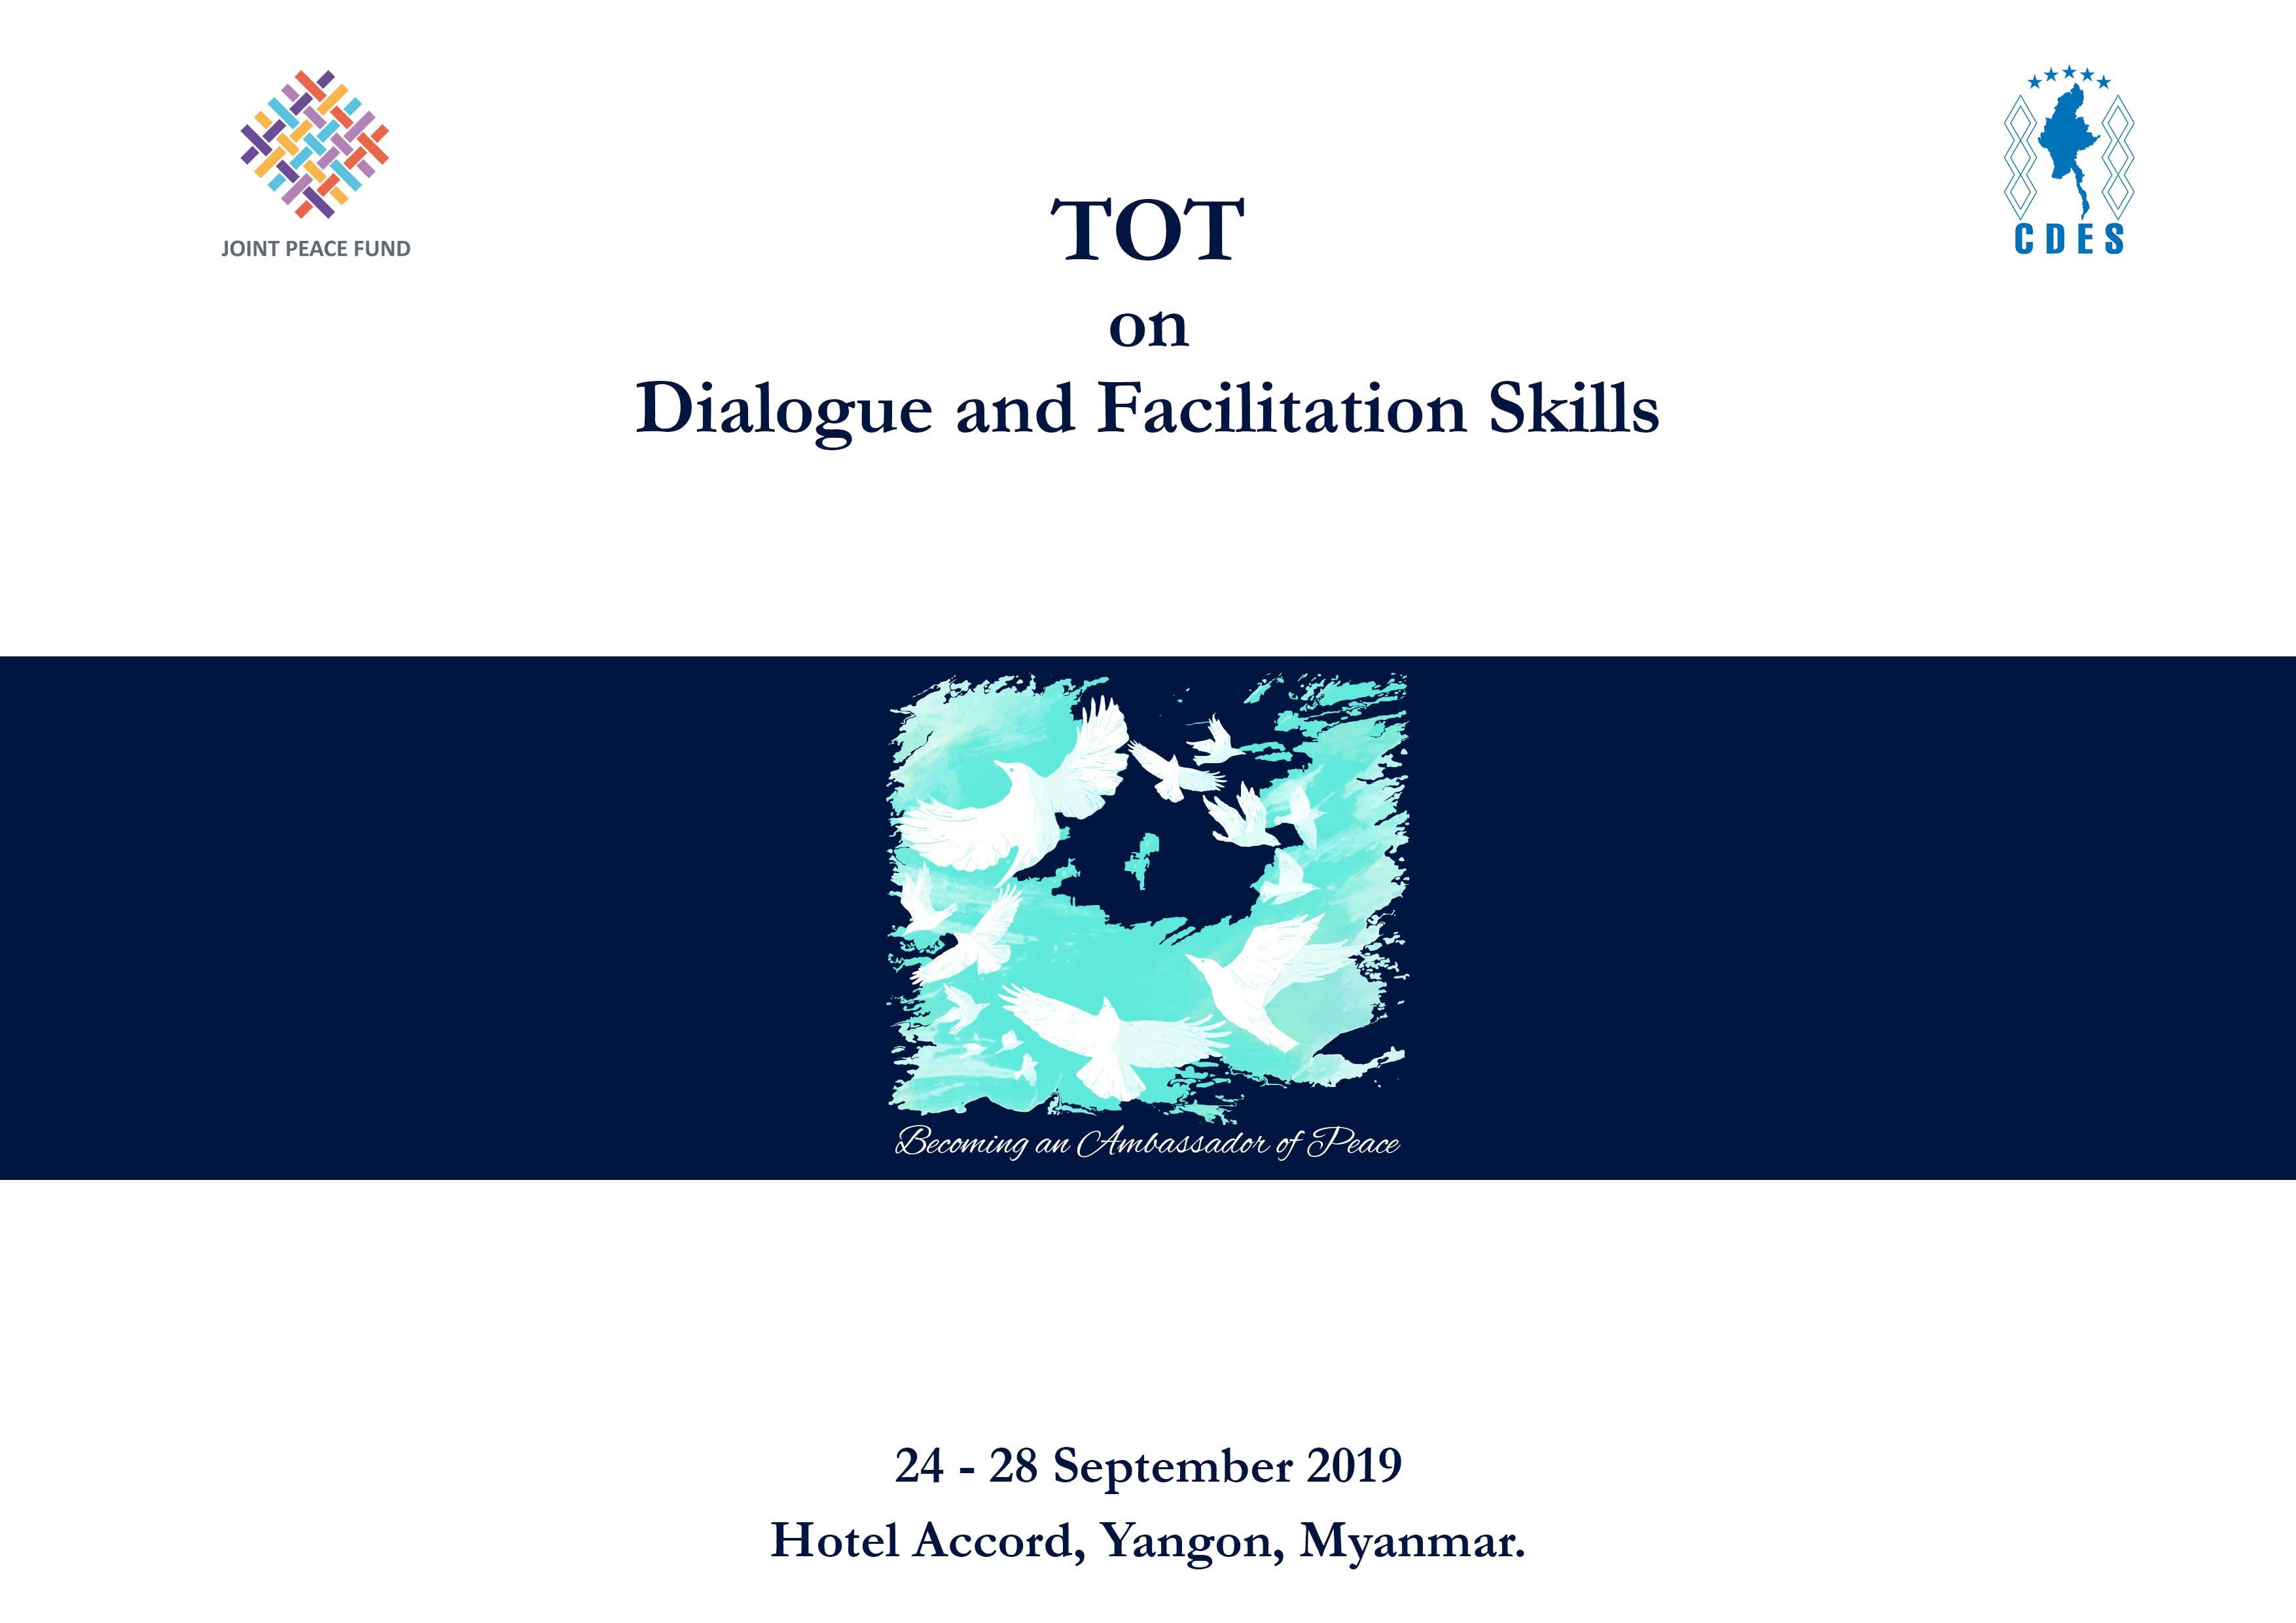 TOT on Dialogue and Facilitation Skills (II)